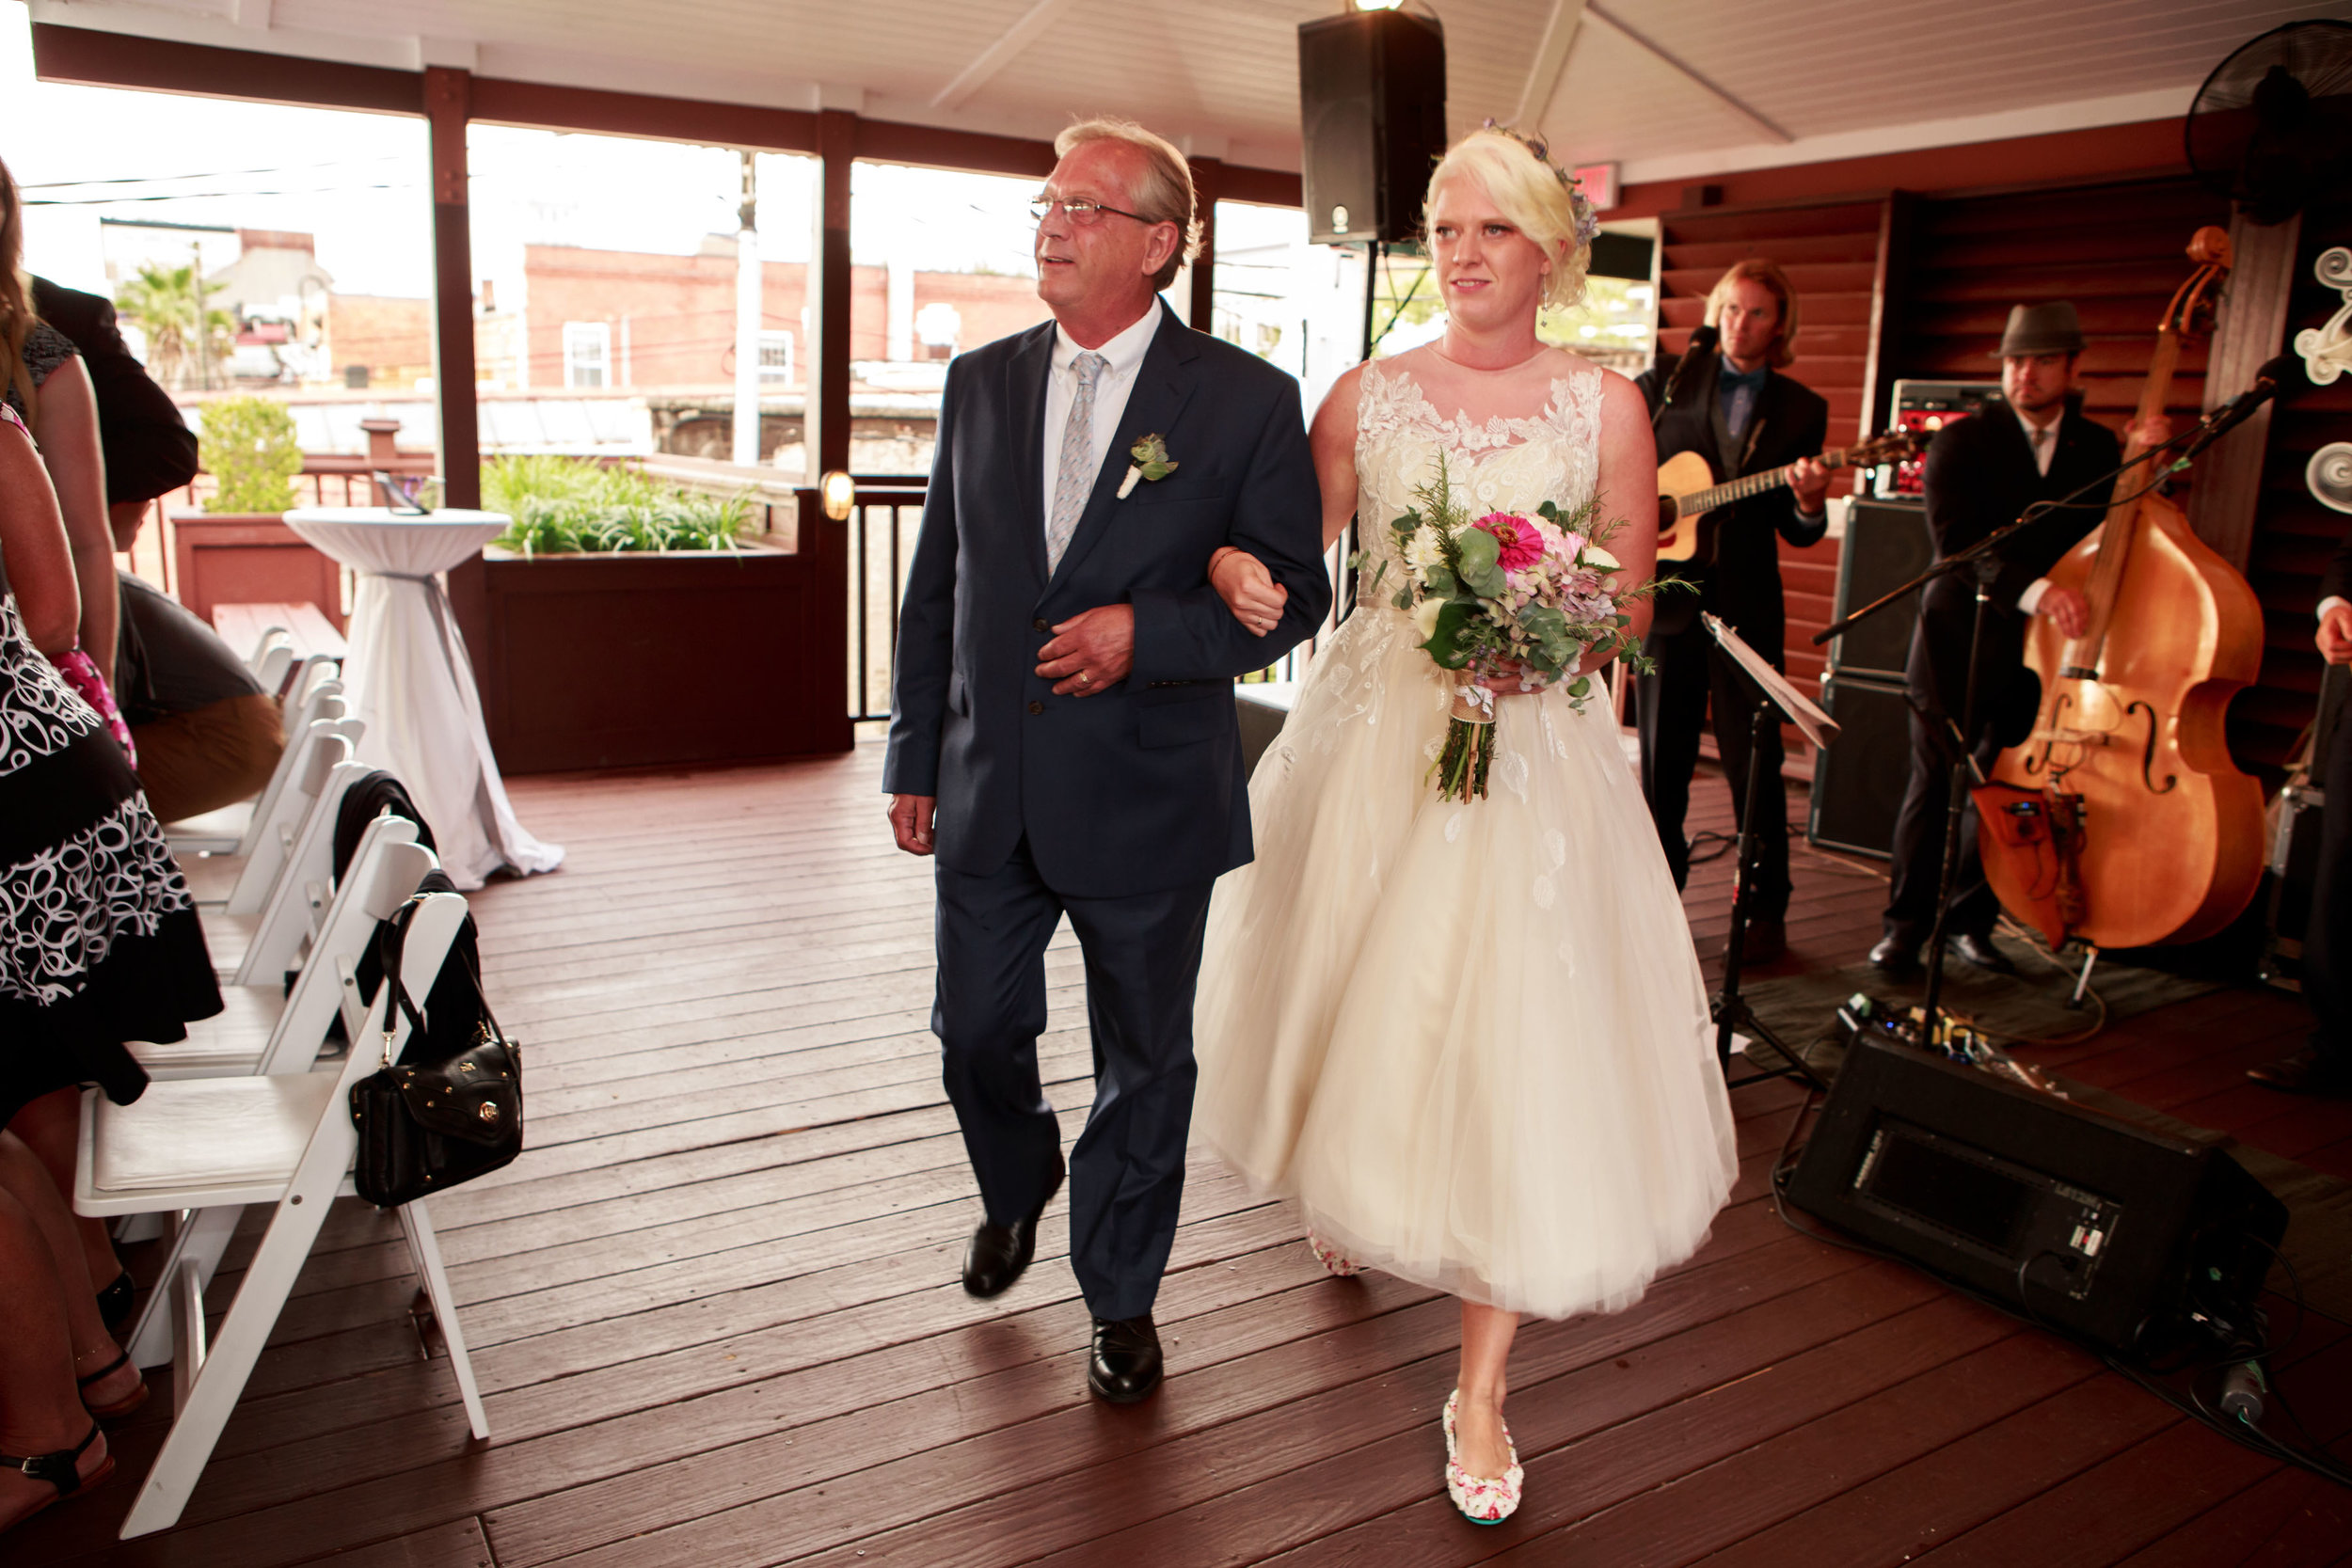 128-South-Wedding-Wilmington-NC-Photographer-Ceremony-011.2.jpg